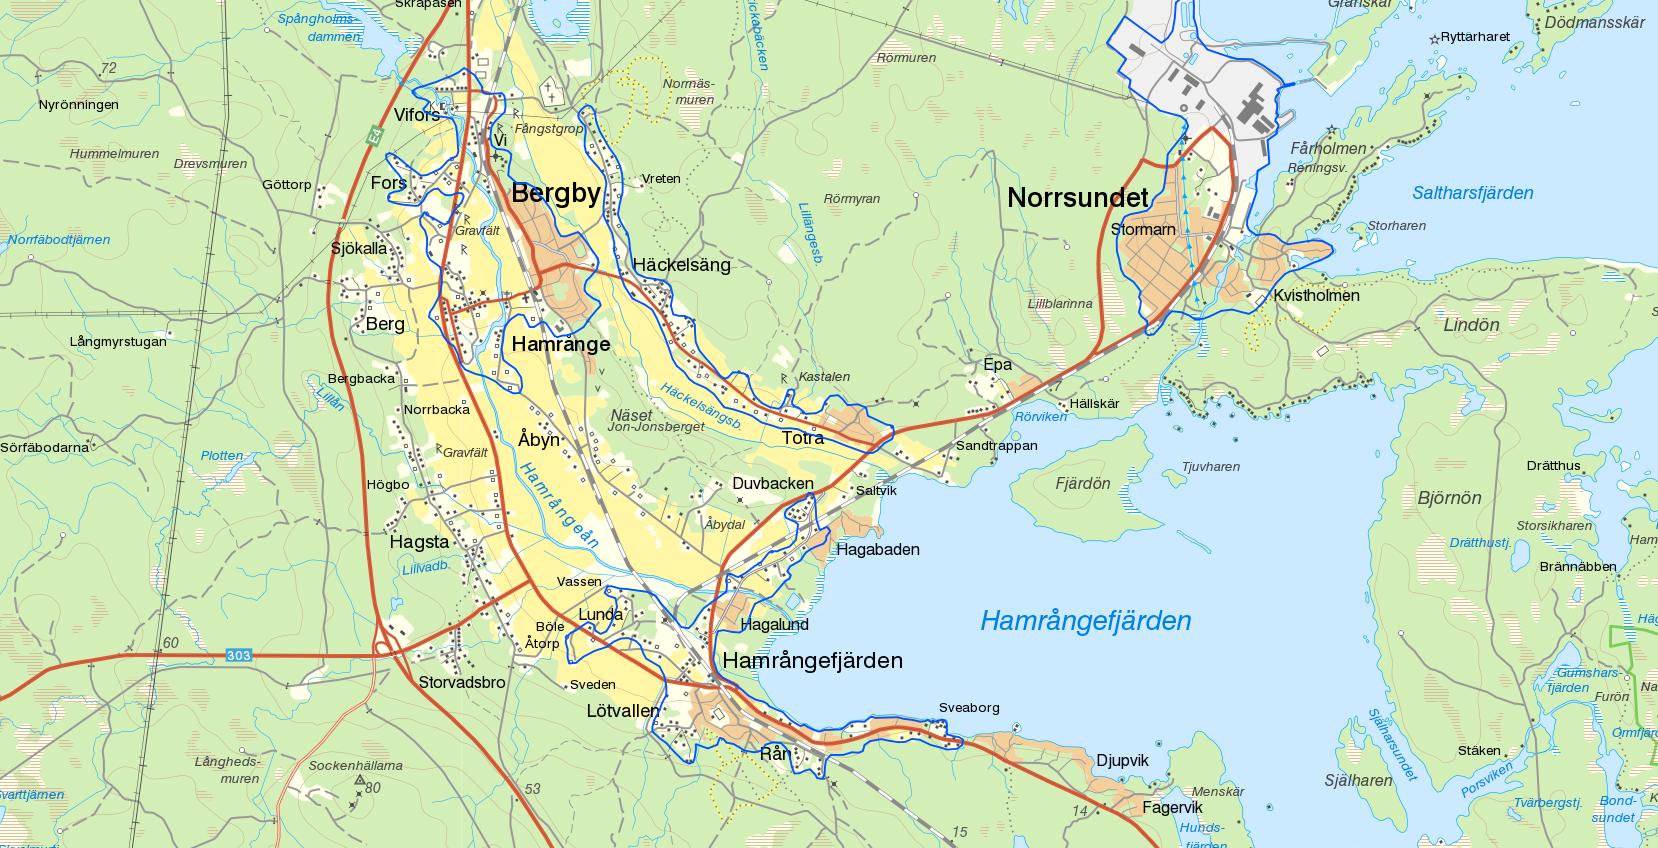 Gratis Lang Porrfilm Knulla Aldre Kvinna Hamrnge Stora